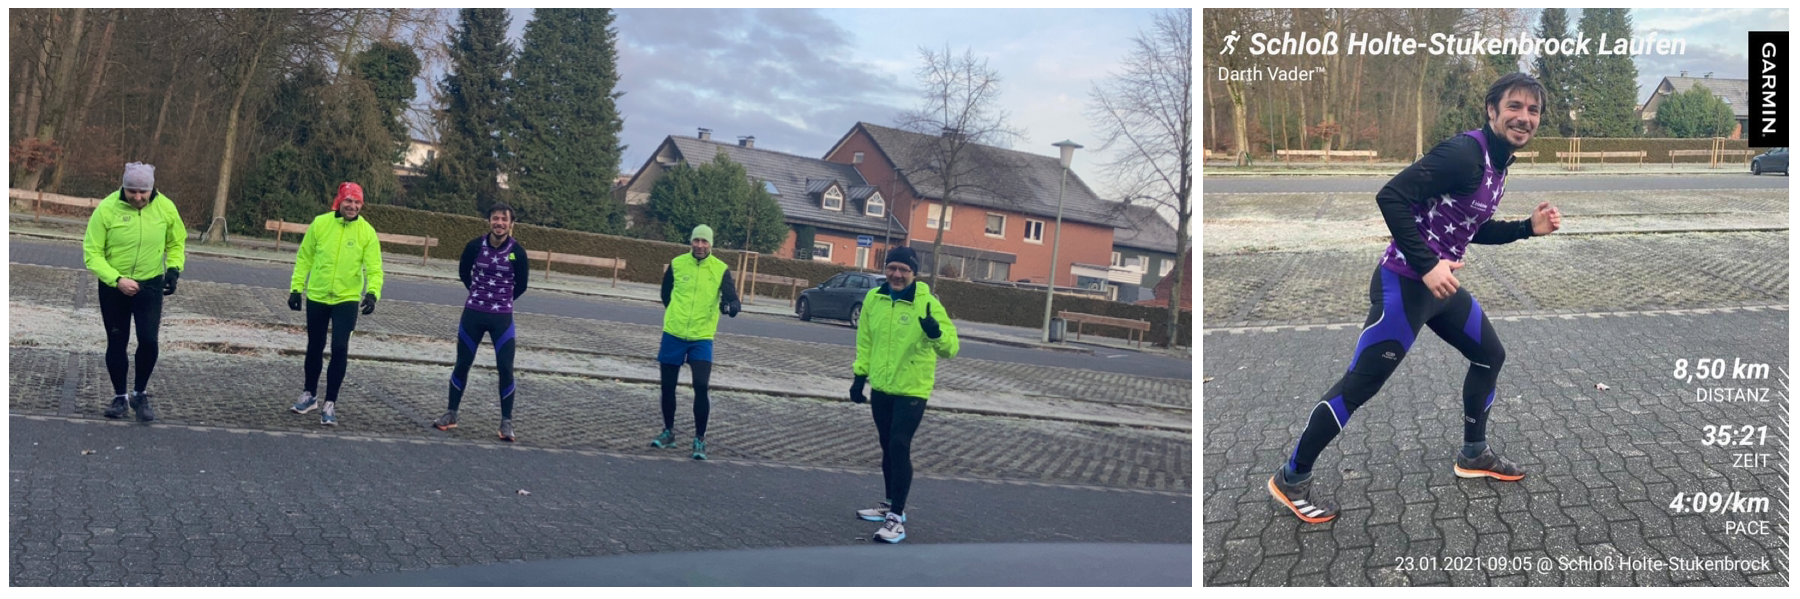 Klassen-Harry-4-Challenge-Marathon-Team-WNR2v